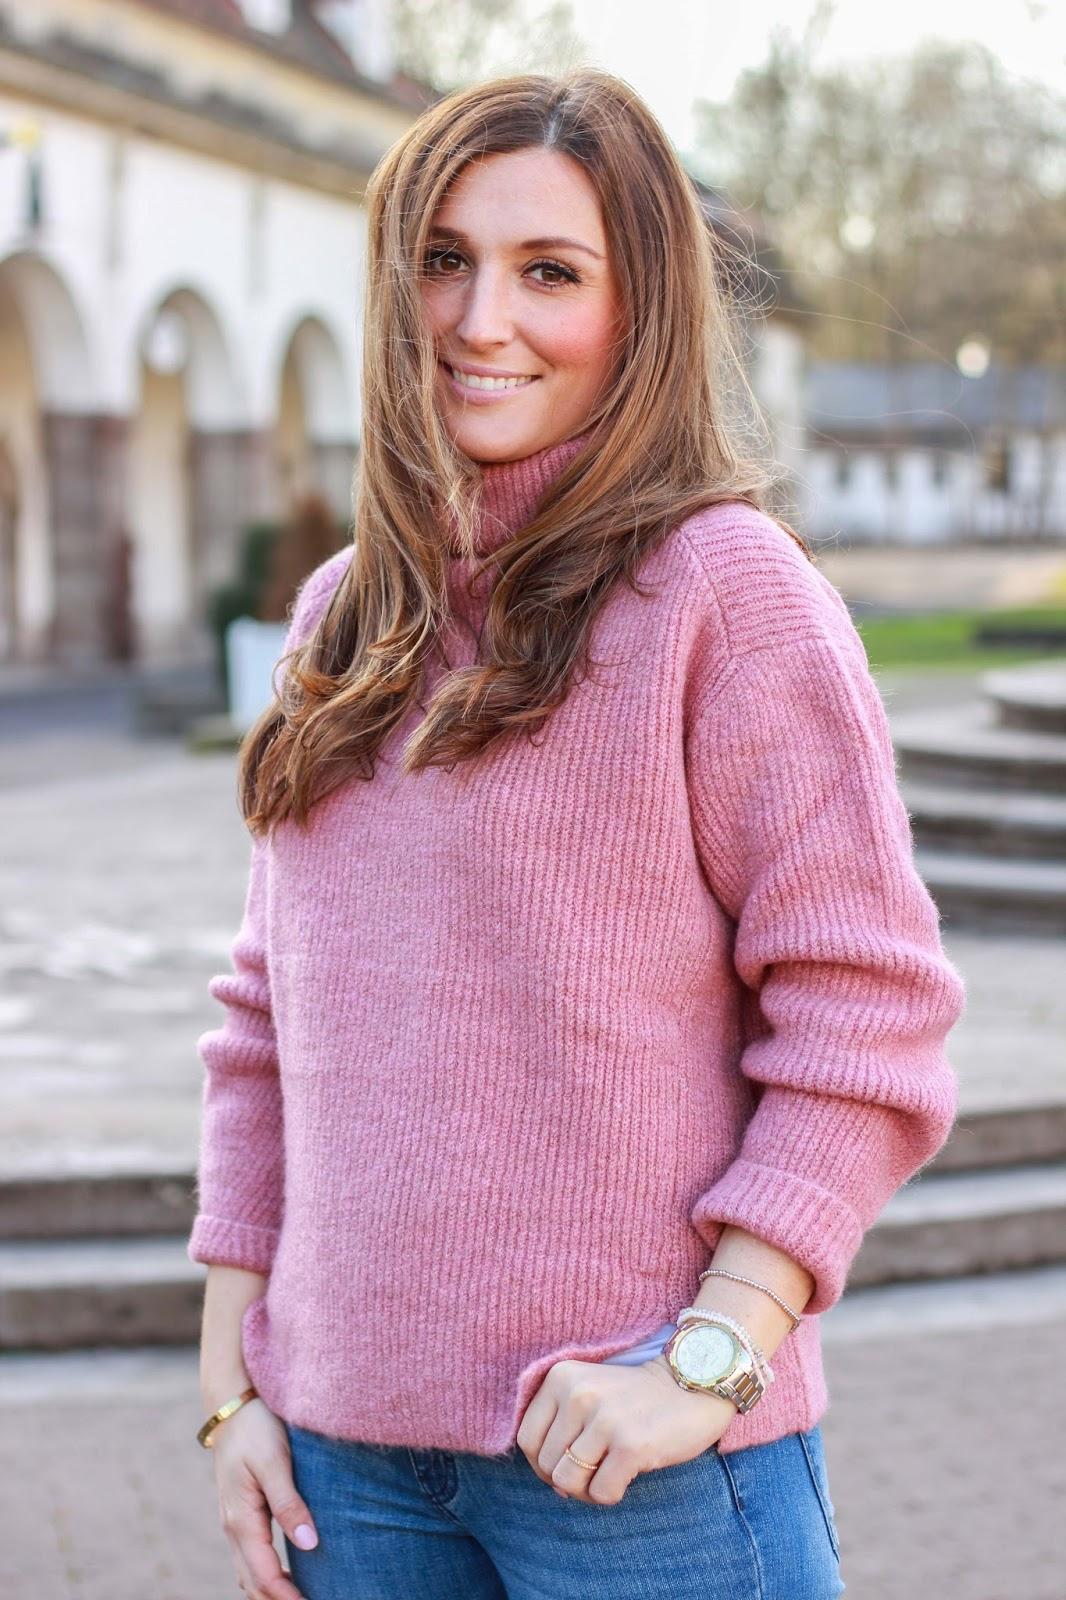 Rosa Rolli - Outfitinspiration Fashionblogger - Modeblogger - Frankfurt Fashionblogger